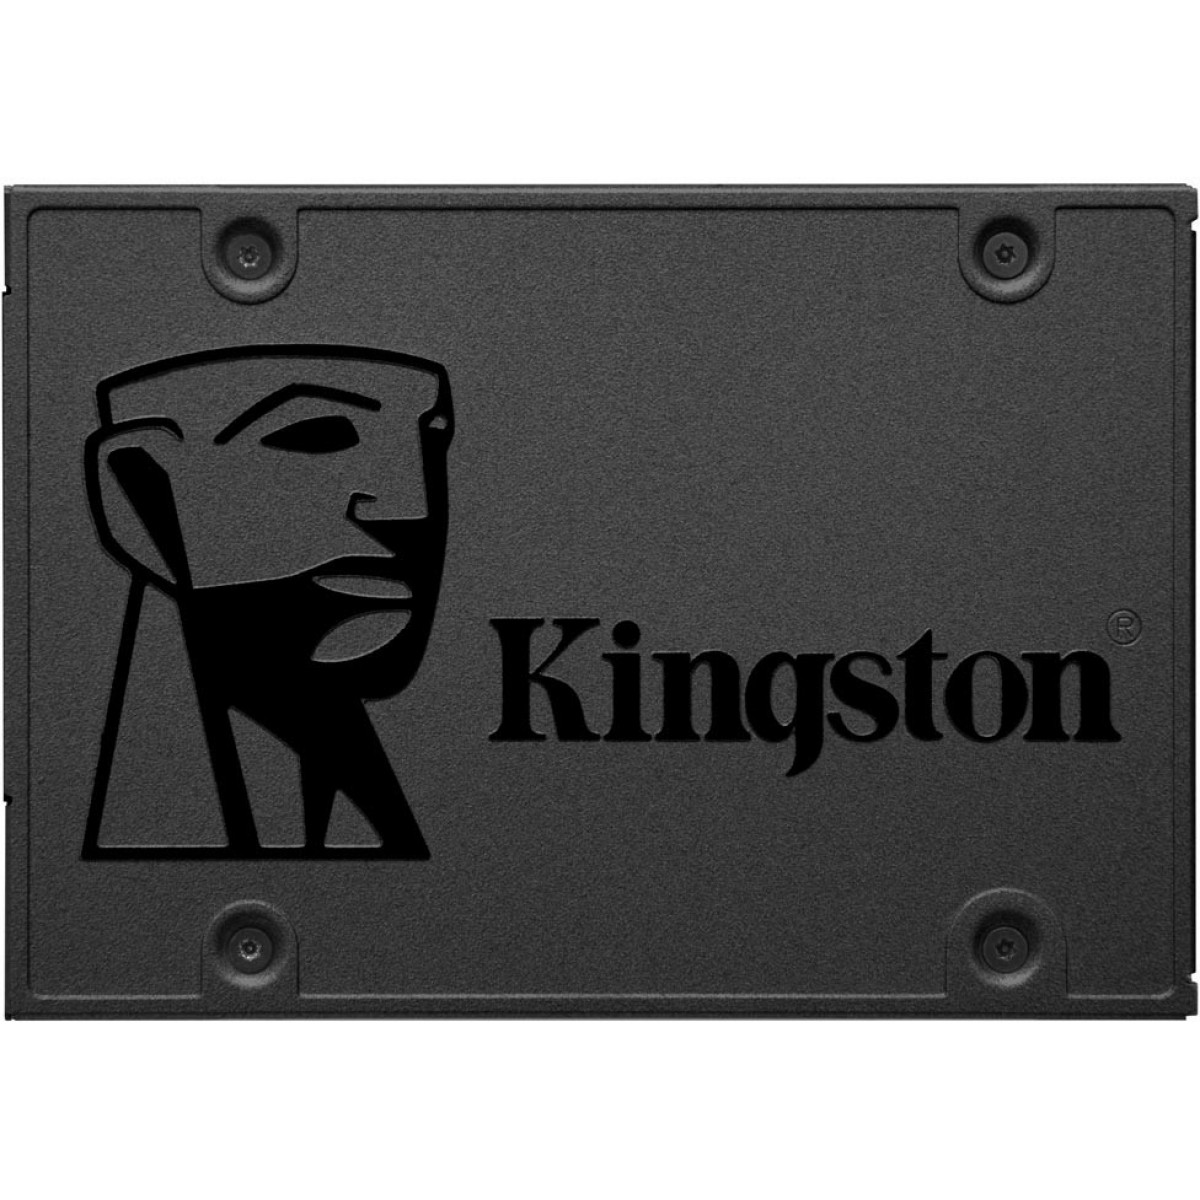 SSD Kingston A400, 480GB, Sata III, Leitura 500MBs Gravação 450MBs, SA400S37/480G